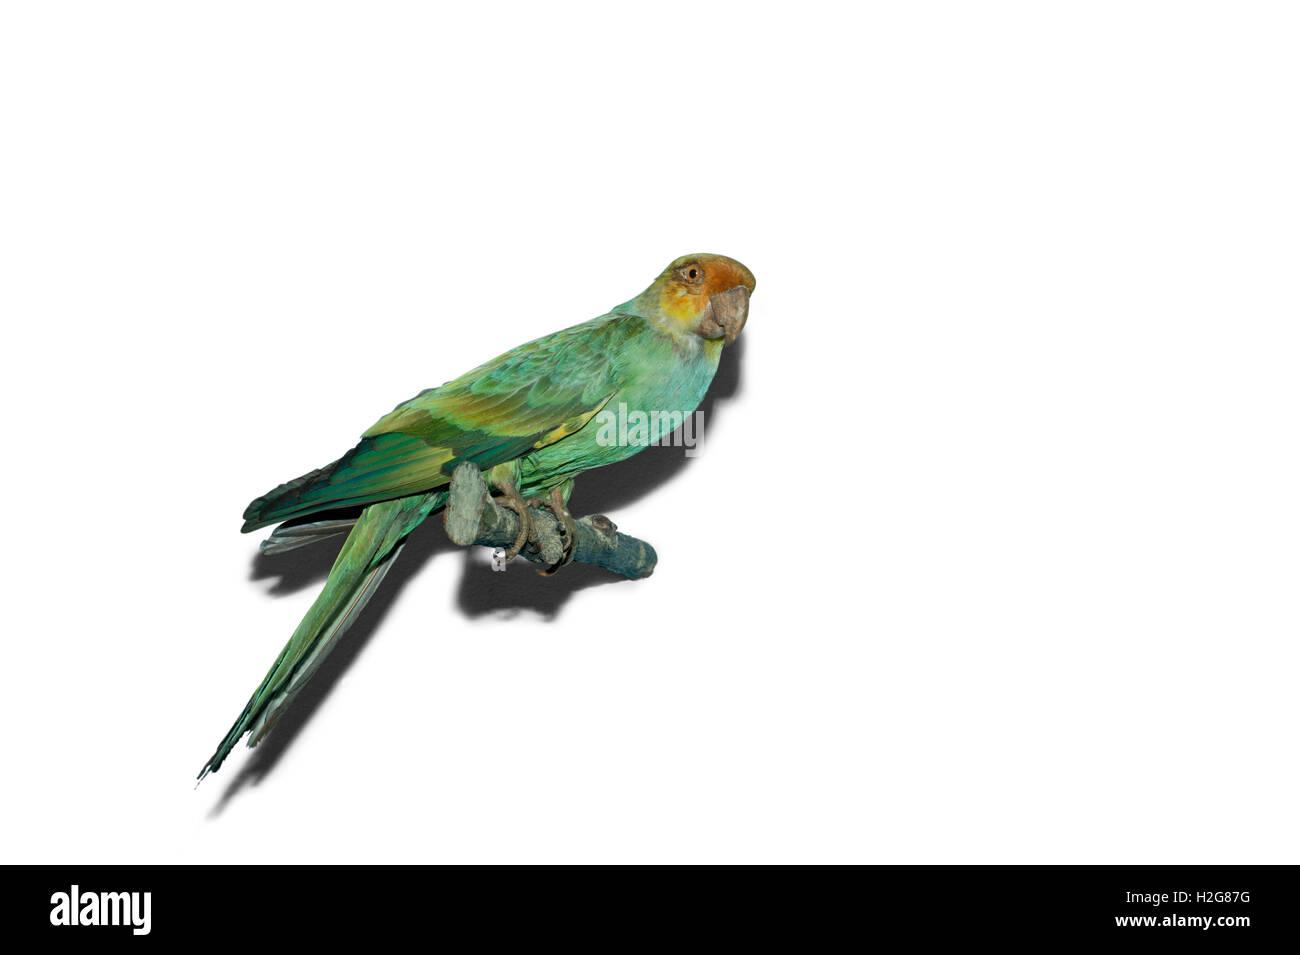 Carolina Parakeet from North America now extinct - Stock Image